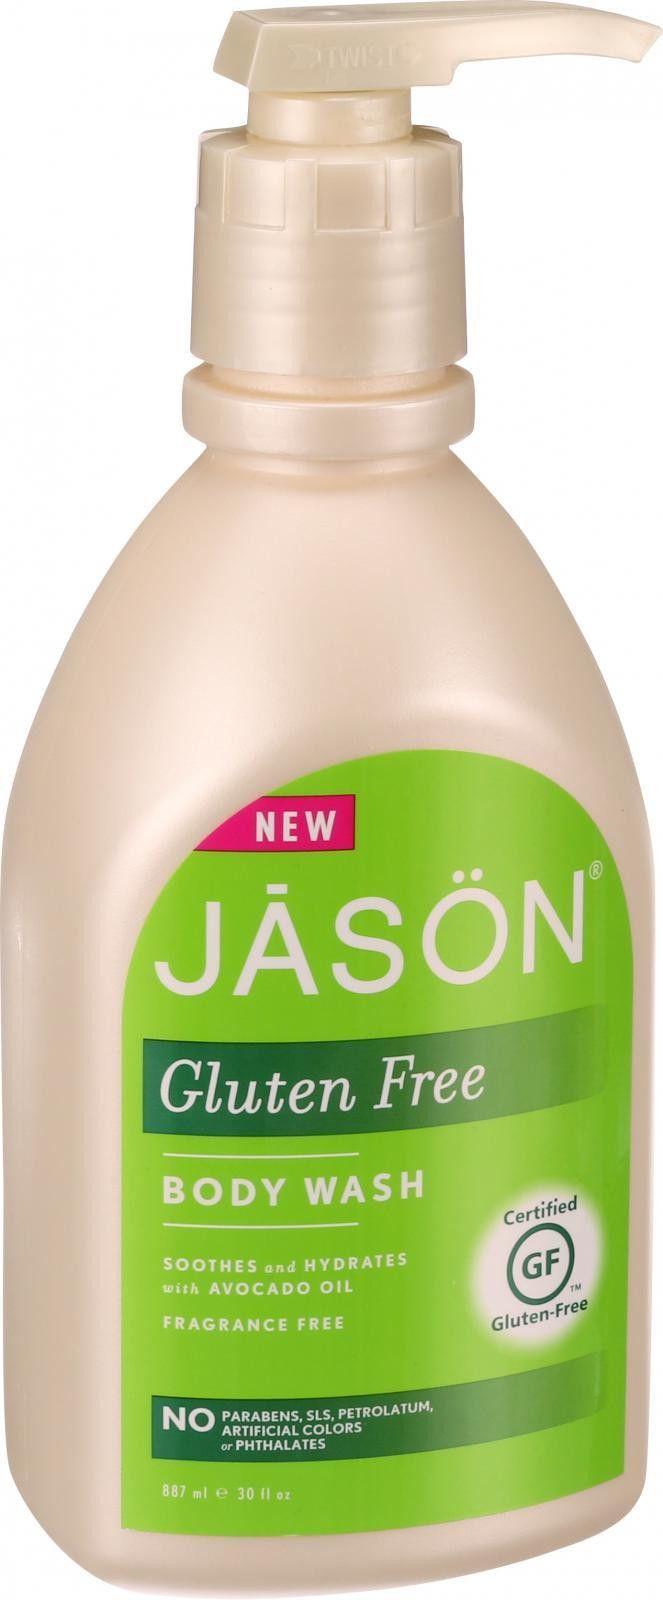 Jason Natural Products Body Wash - Gluten Free - Fragrance Free - 30 Oz